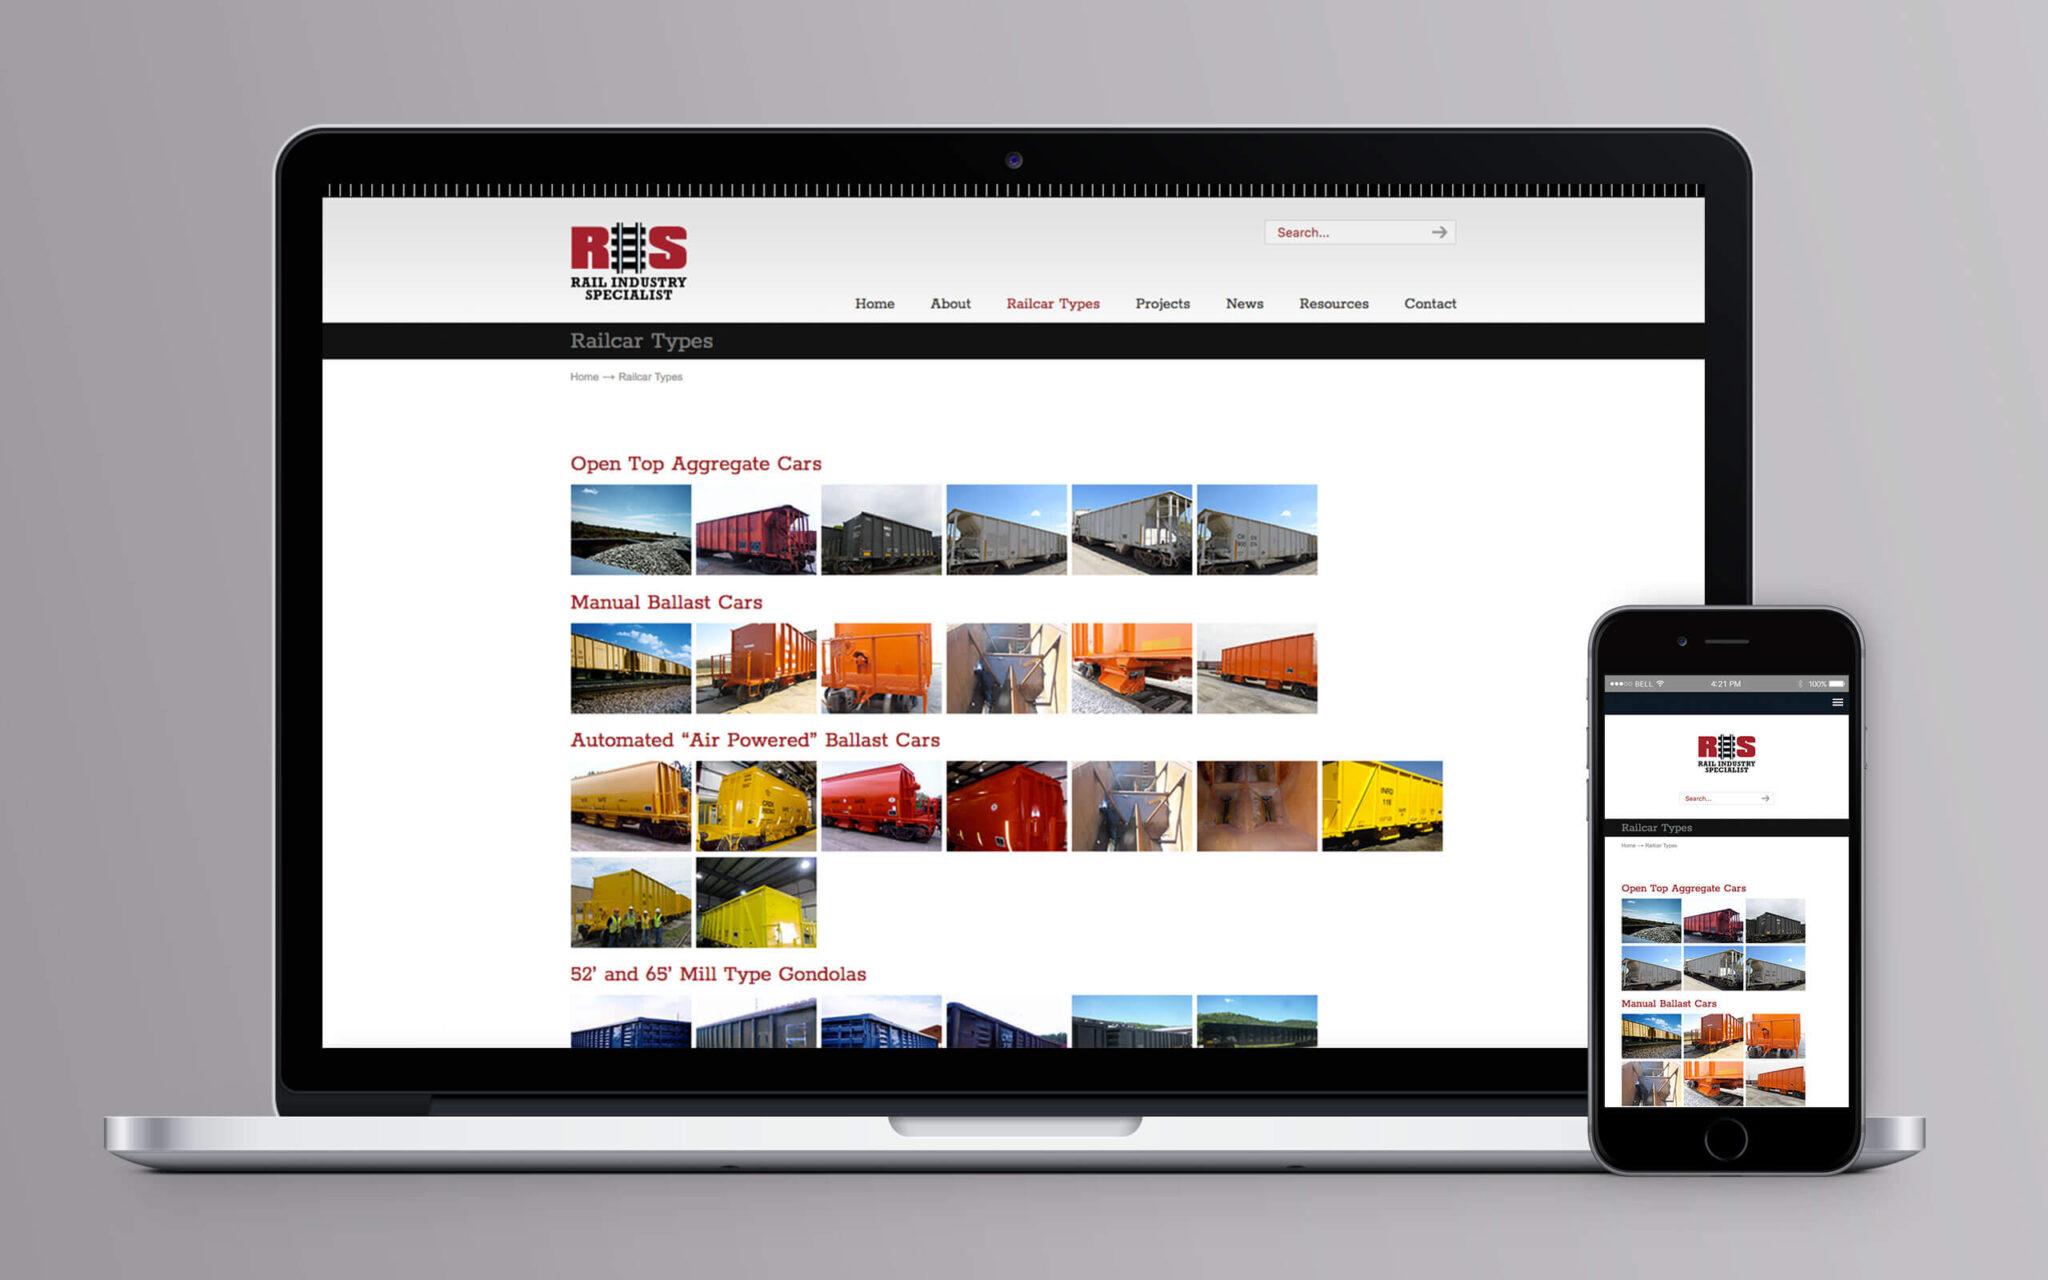 Rail Industry Specialist Website Railcar Types